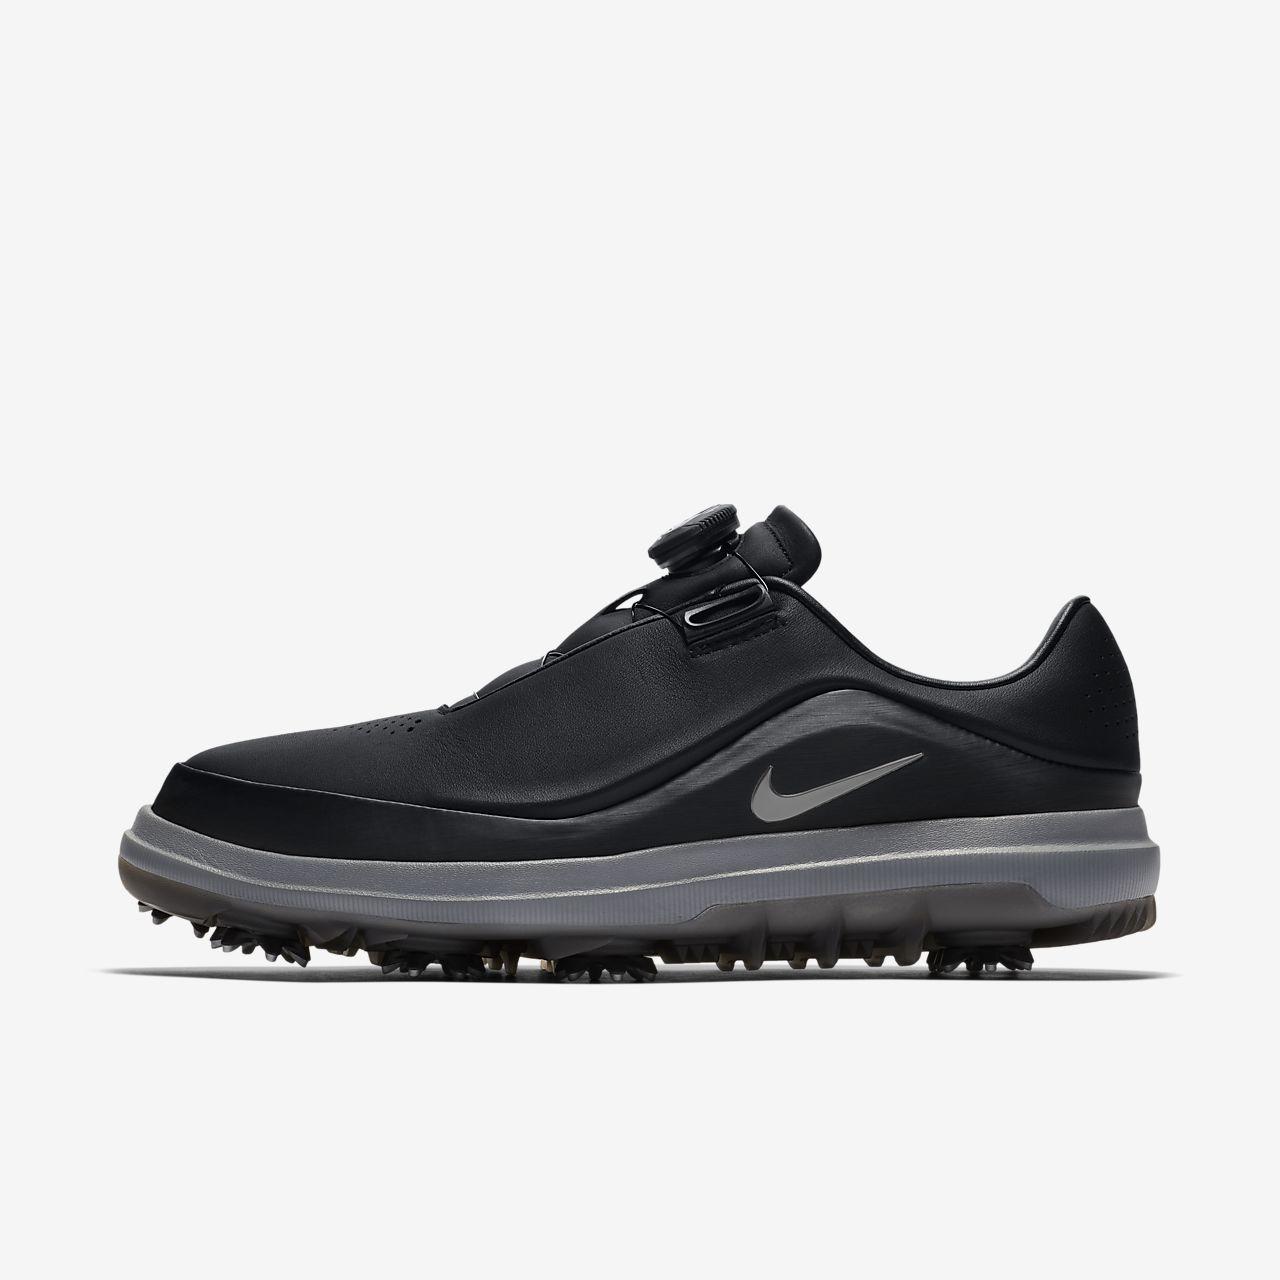 brand new 689fa 204f1 ... Nike Air Zoom Precision BOA ® Mens Golf Shoe